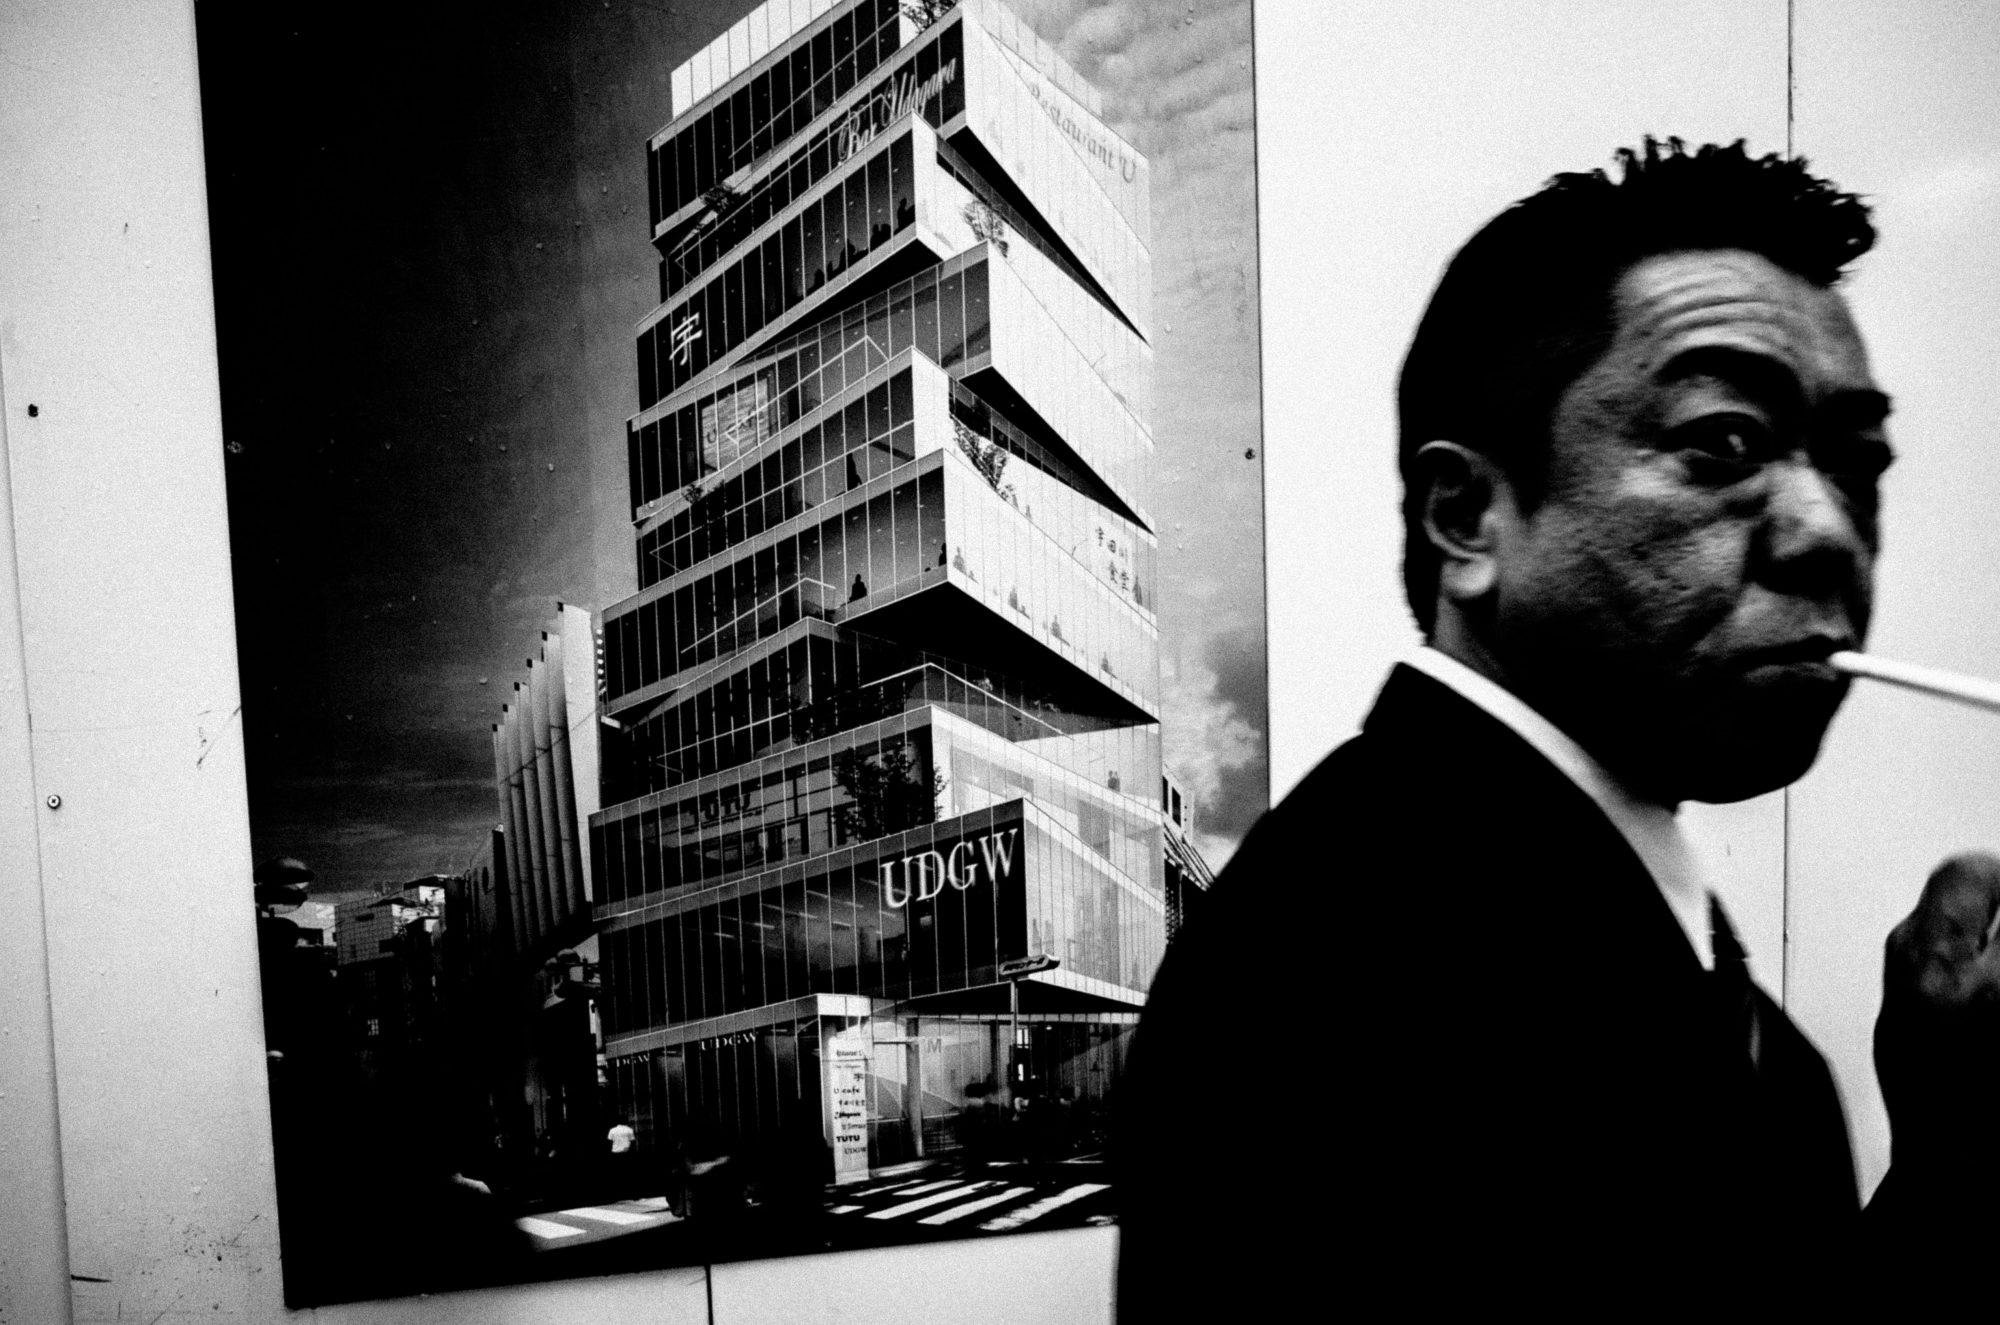 Eric-kim-Street-photography-black-and-white-Tokyo-2017-Ricoh-gr-ii-09-2000x1325